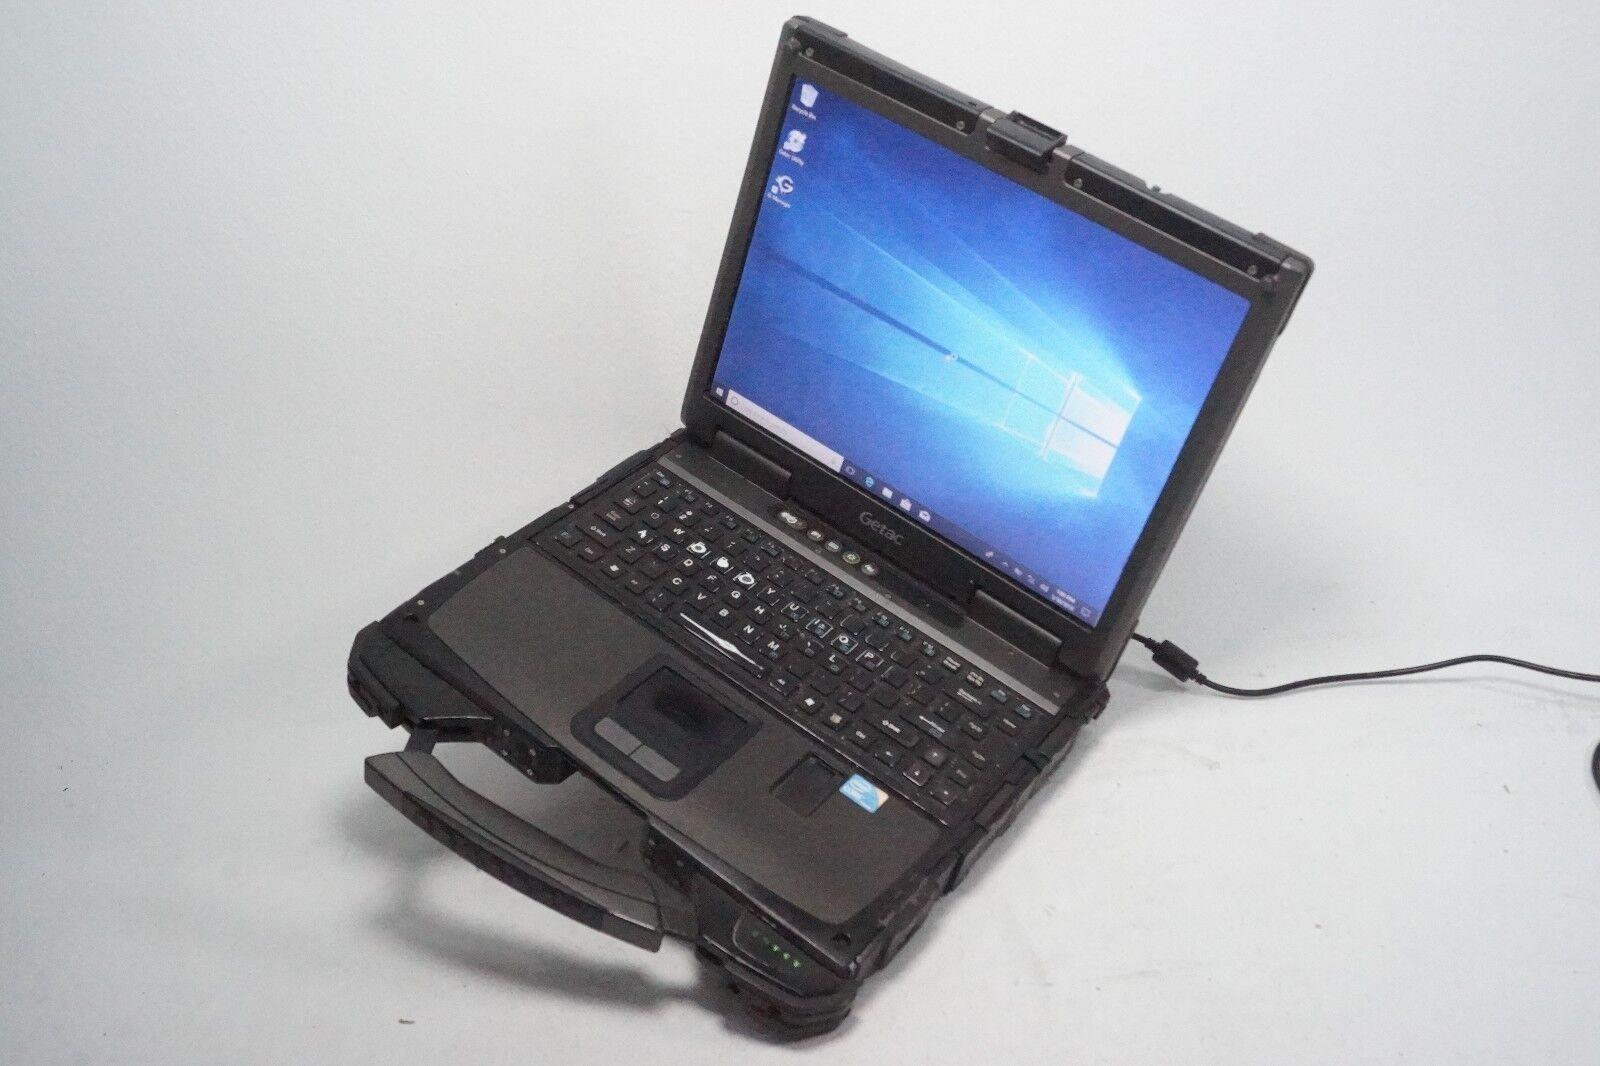 Getac B300-X Ultra Rugged Core i7 2GHz 6GB RAM 240GB SSD W10 PRO TouchScreen GPS